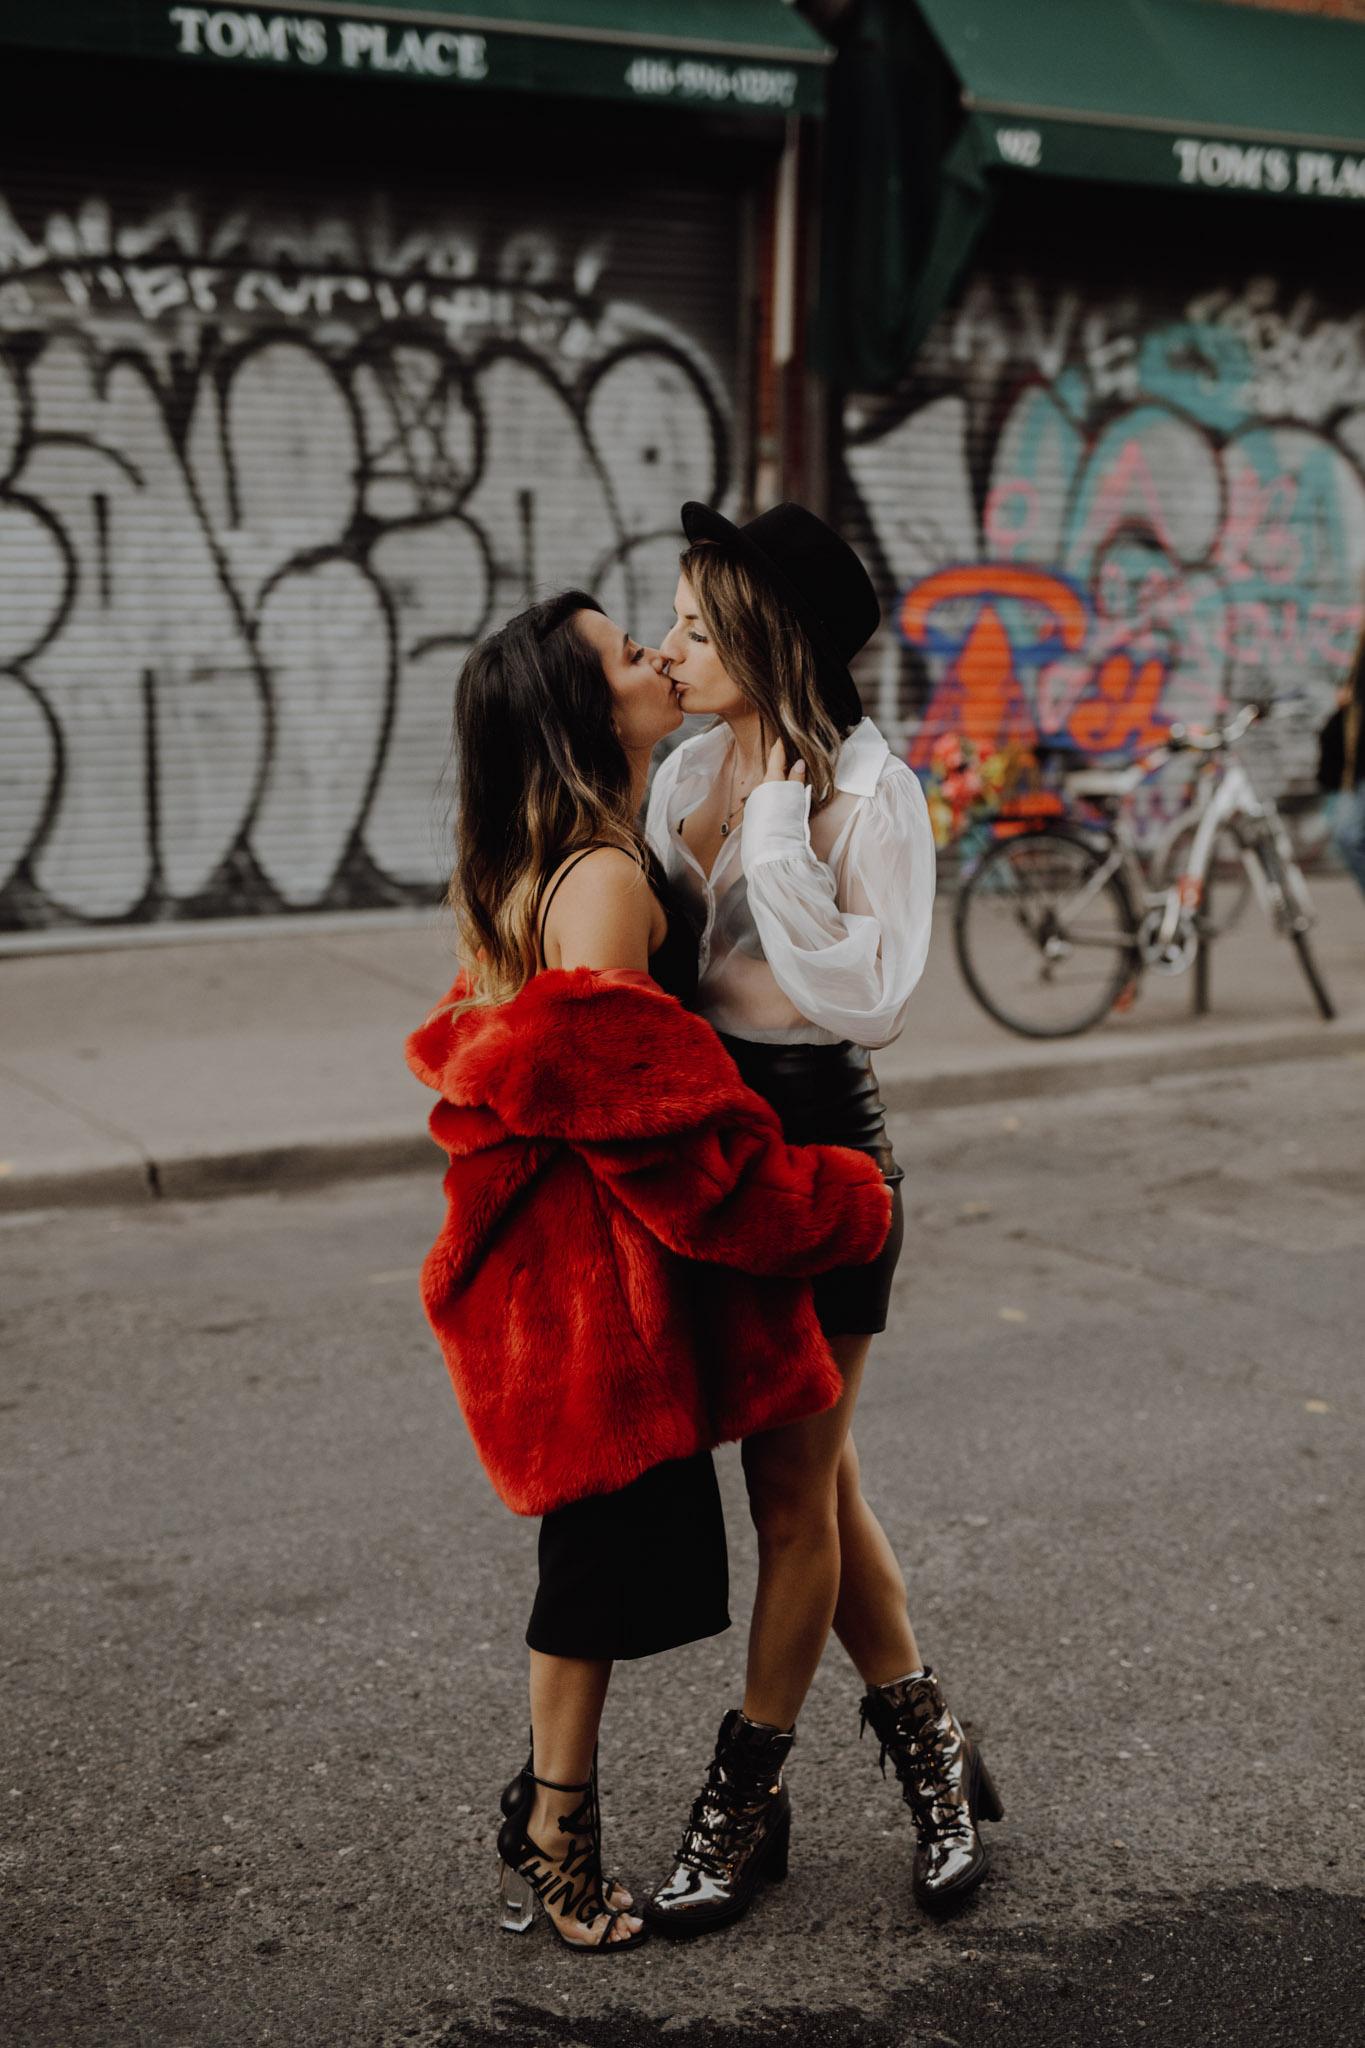 Toronto LGBTQ Engagement Photographer - the kiss